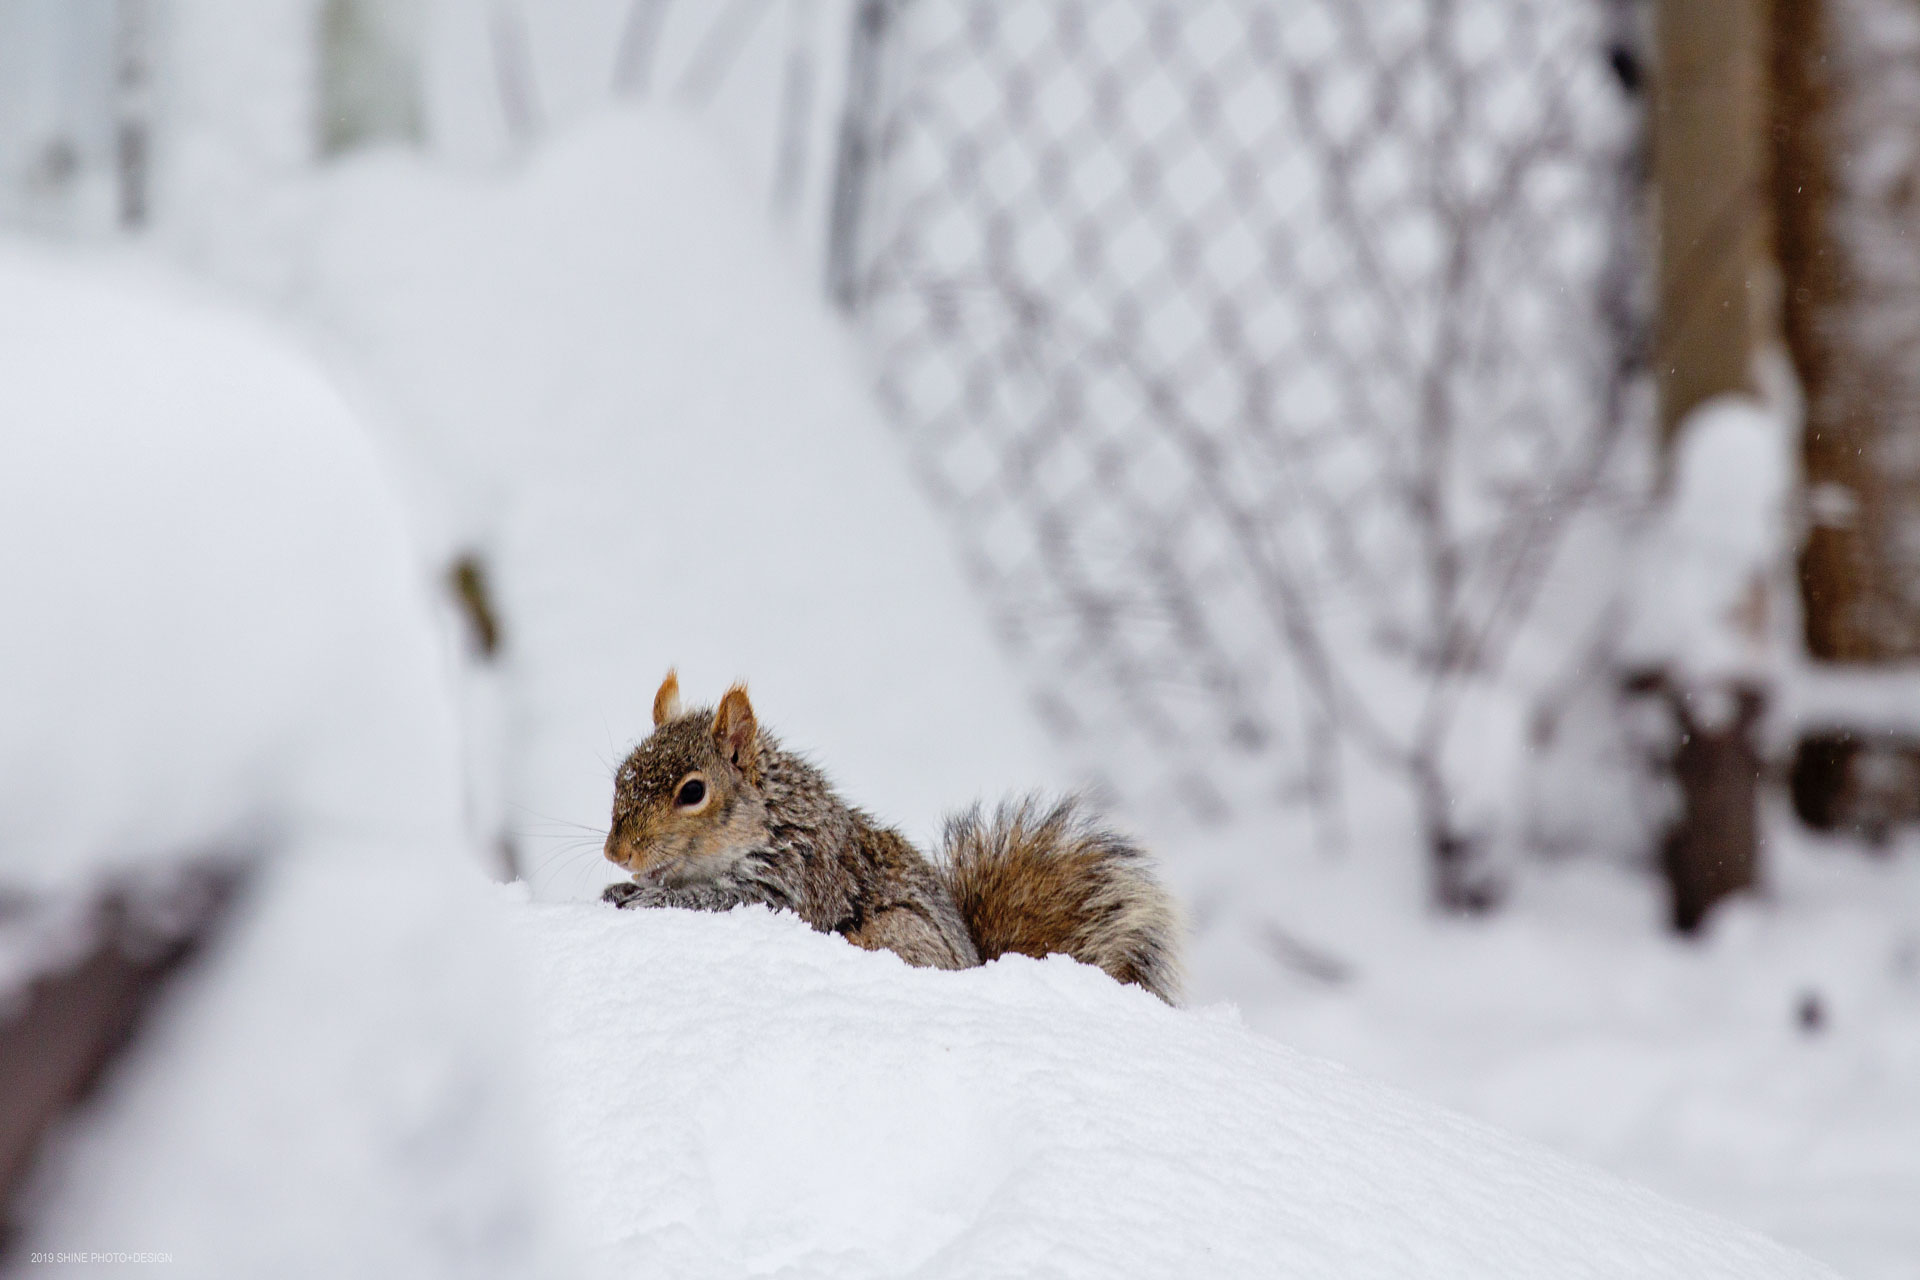 Winter Squirrel by Shine Photo Design